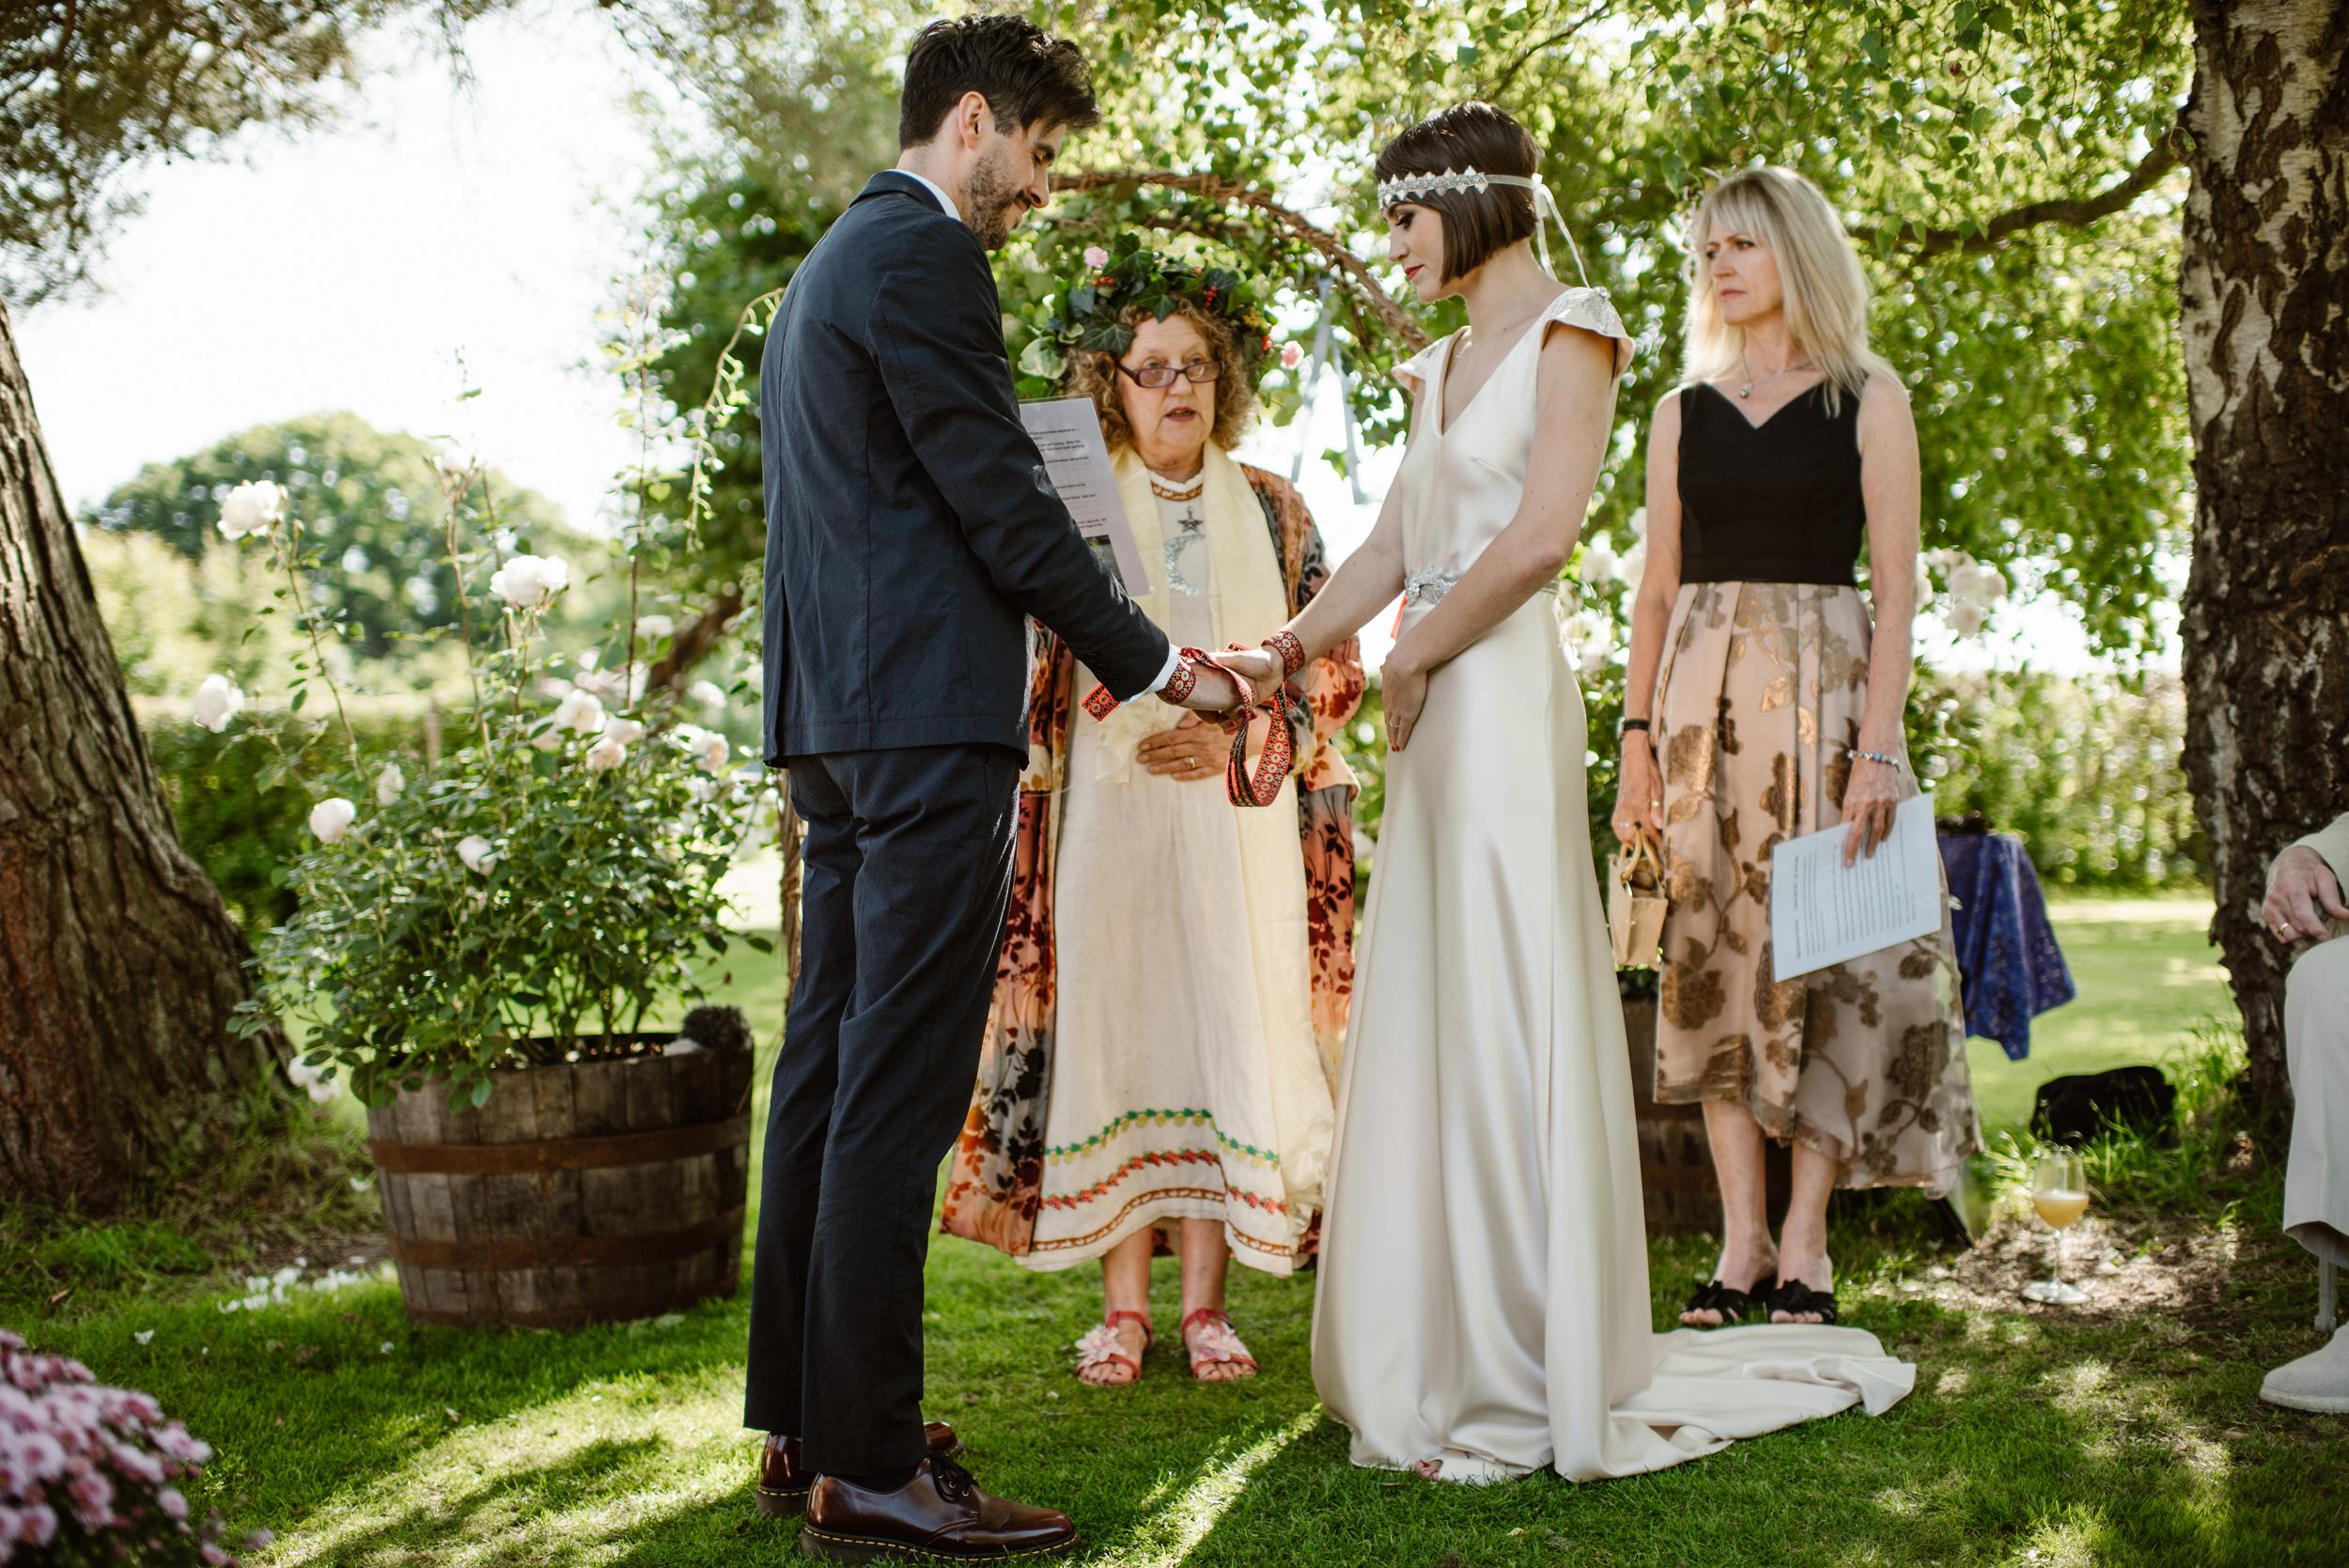 Ro-Kate-Beaumont-bias-cut-silk-wedding-gown-back-garden-wedding-by-Ellie-Gillard-8.jpg